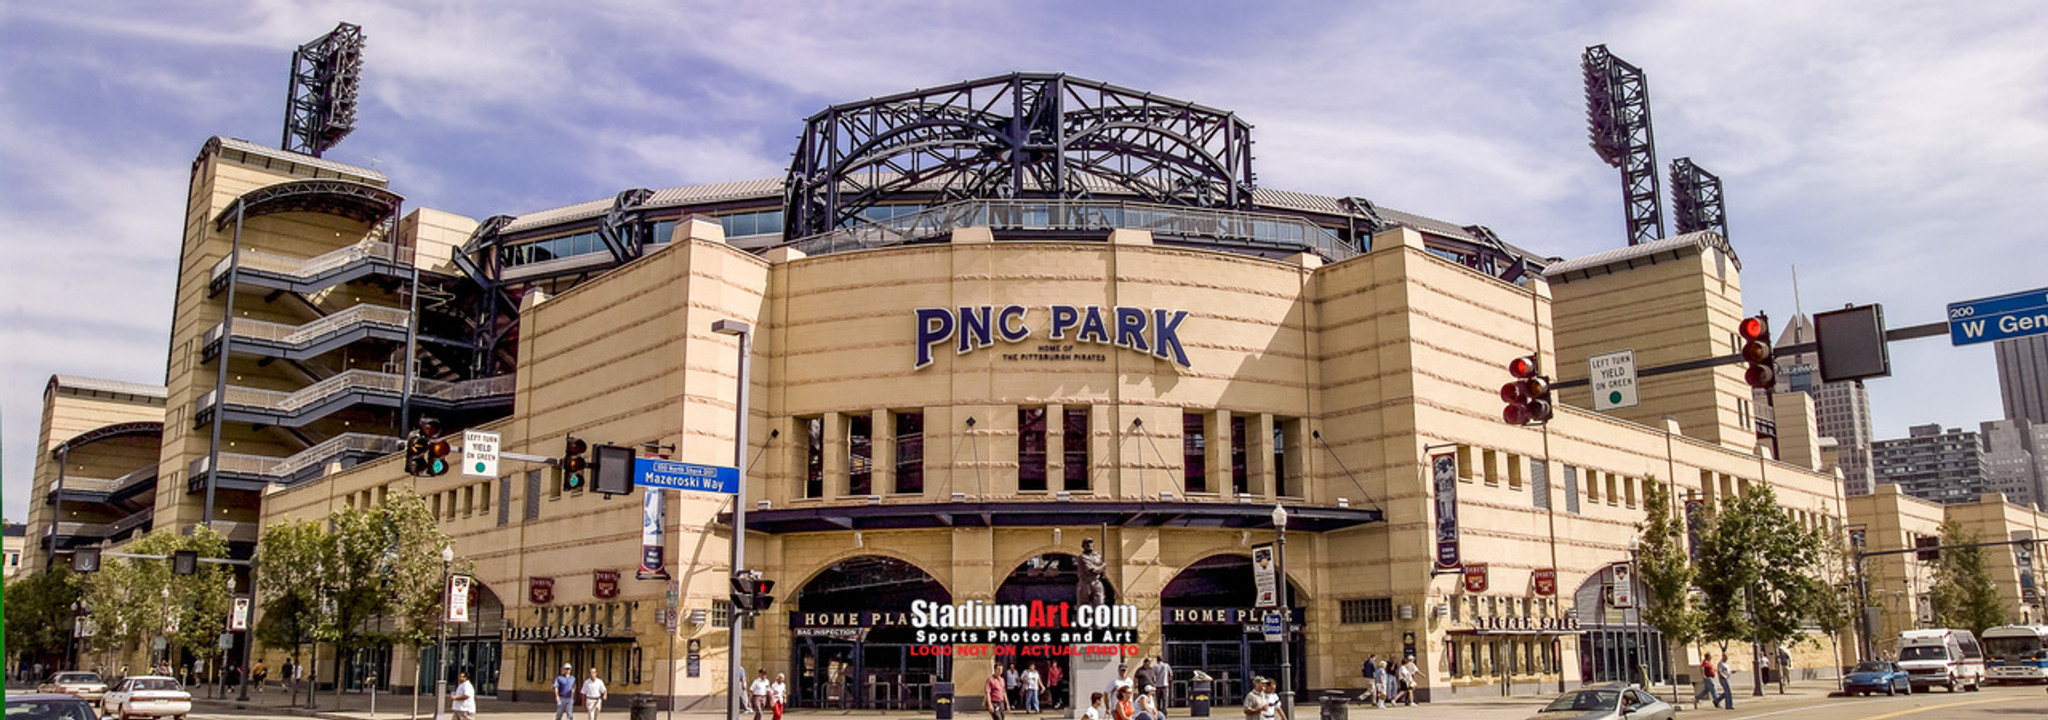 Pittsburgh Pirates Pnc Park Baseball Stadium 8x10 To 48x36 Photo 40